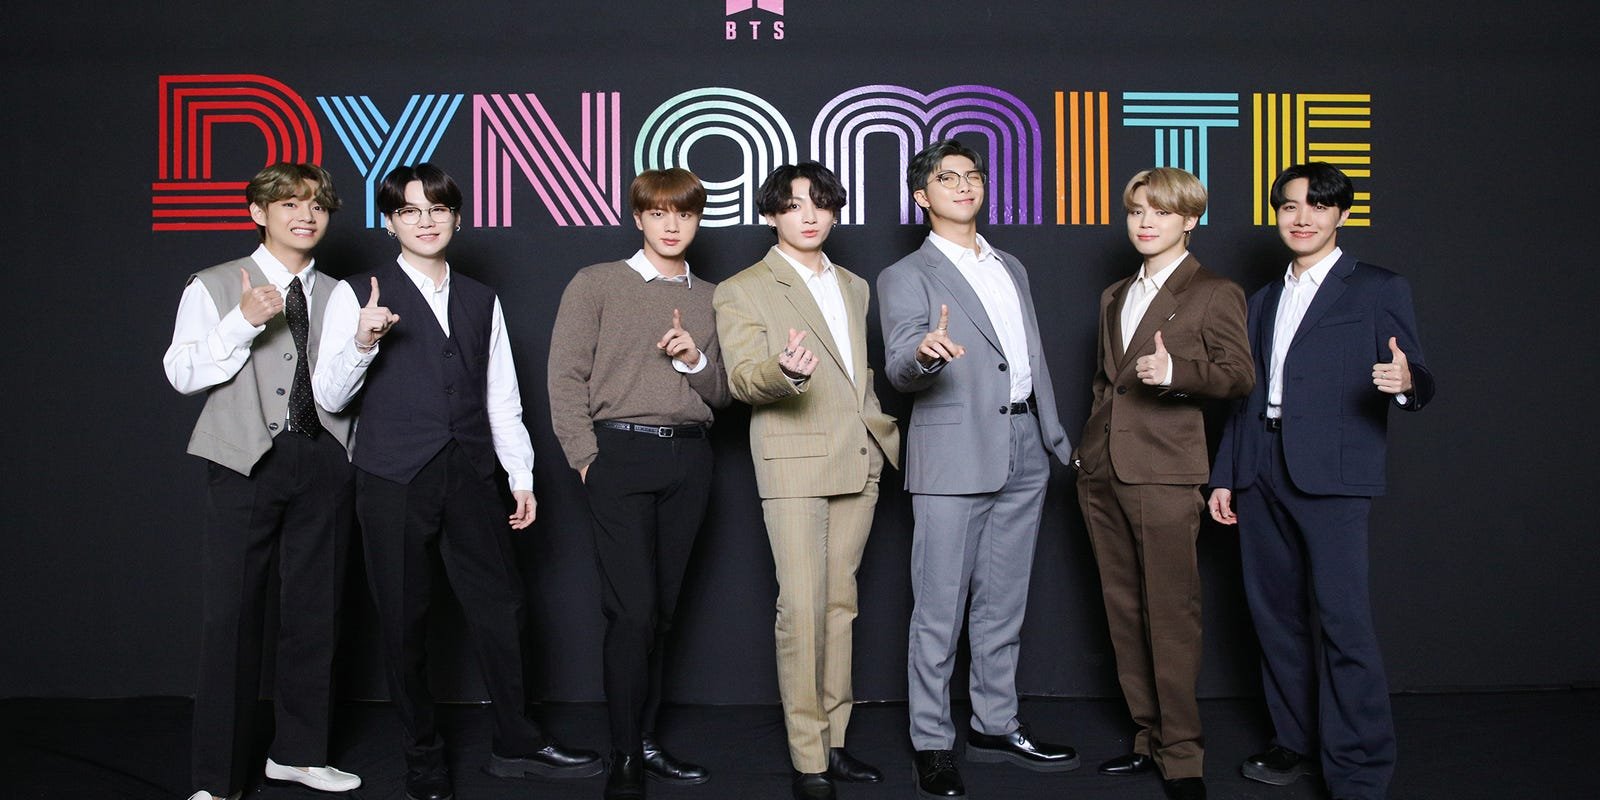 The BTS teacher reveals the academic profile of idols